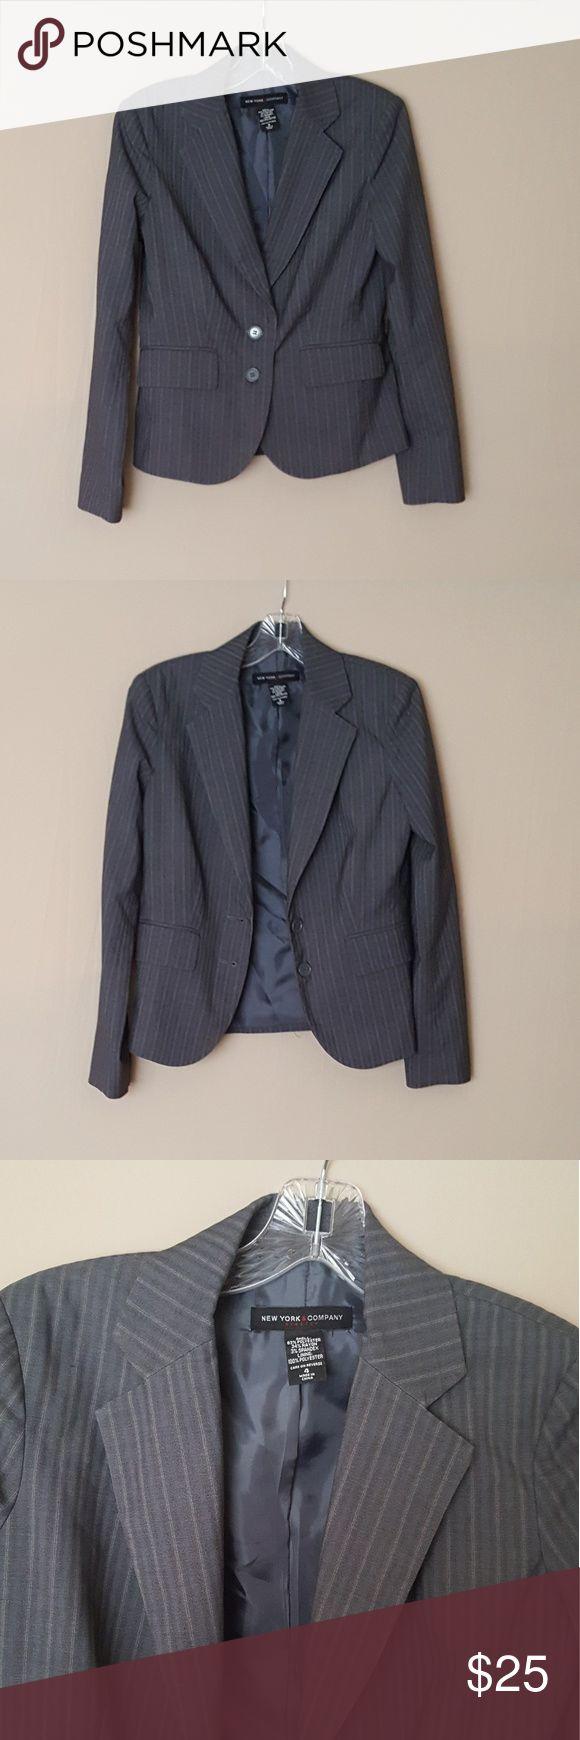 NY & Company Grey Pinstripe Suit Jacket, Blazer Size 4, 63% polyester, 34% rayon, 3% spandex.  Measurements:  Bust 19 inches across Waist 17 inches across 22.5 inches long. New York & Company Jackets & Coats Blazers